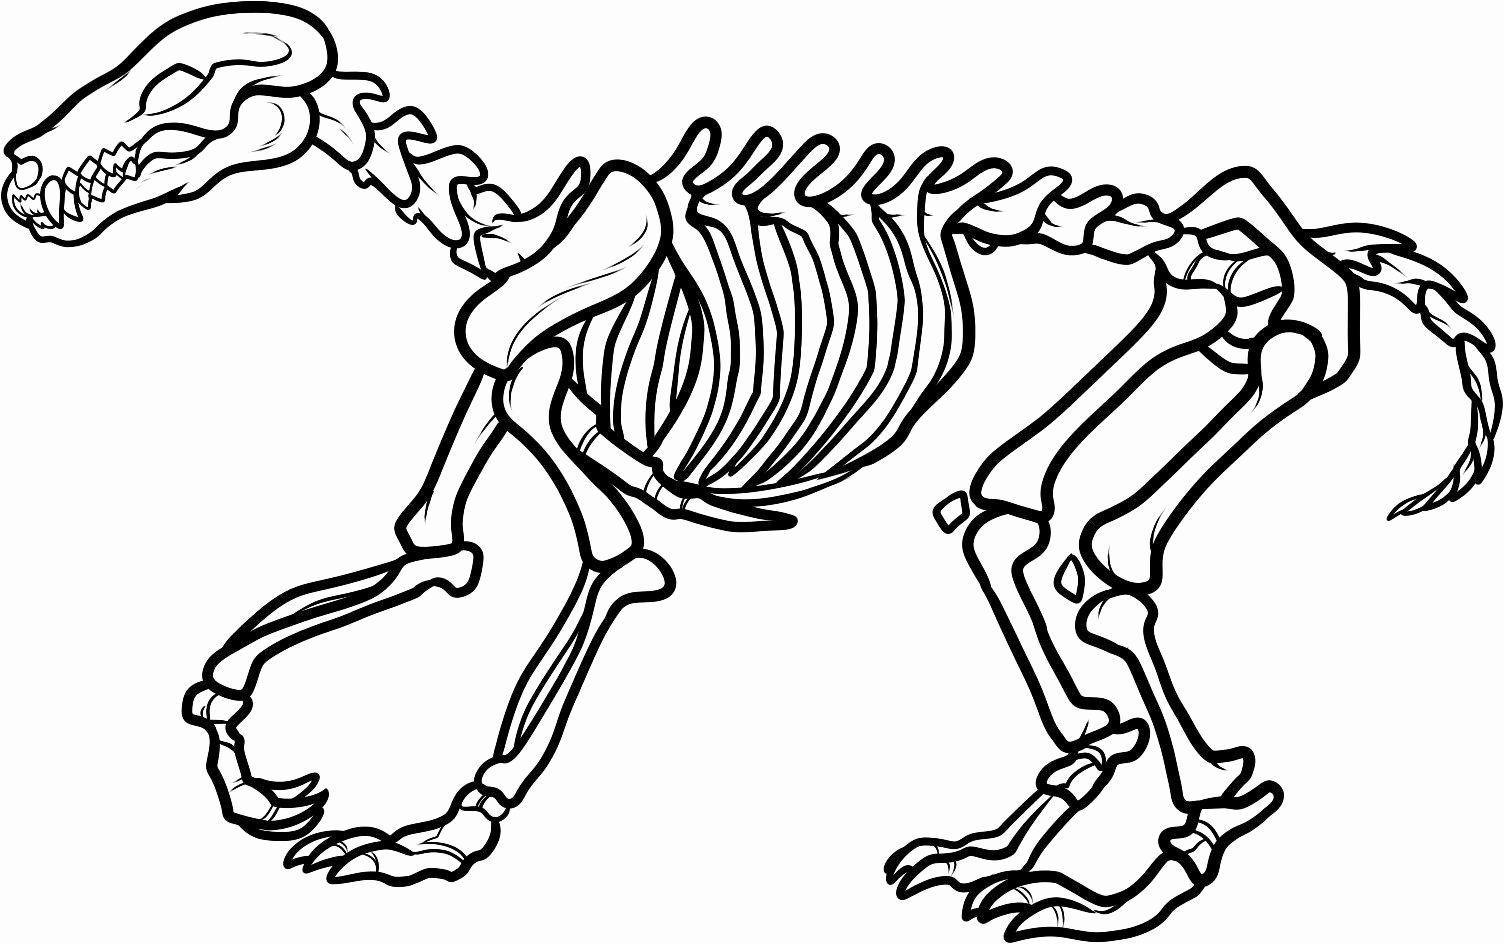 Skeleton Coloring Pages For Preschoolers Beautiful Dog Skeleton Clipart In 2020 Animal Skeletons Dinosaur Coloring Dog Skeleton